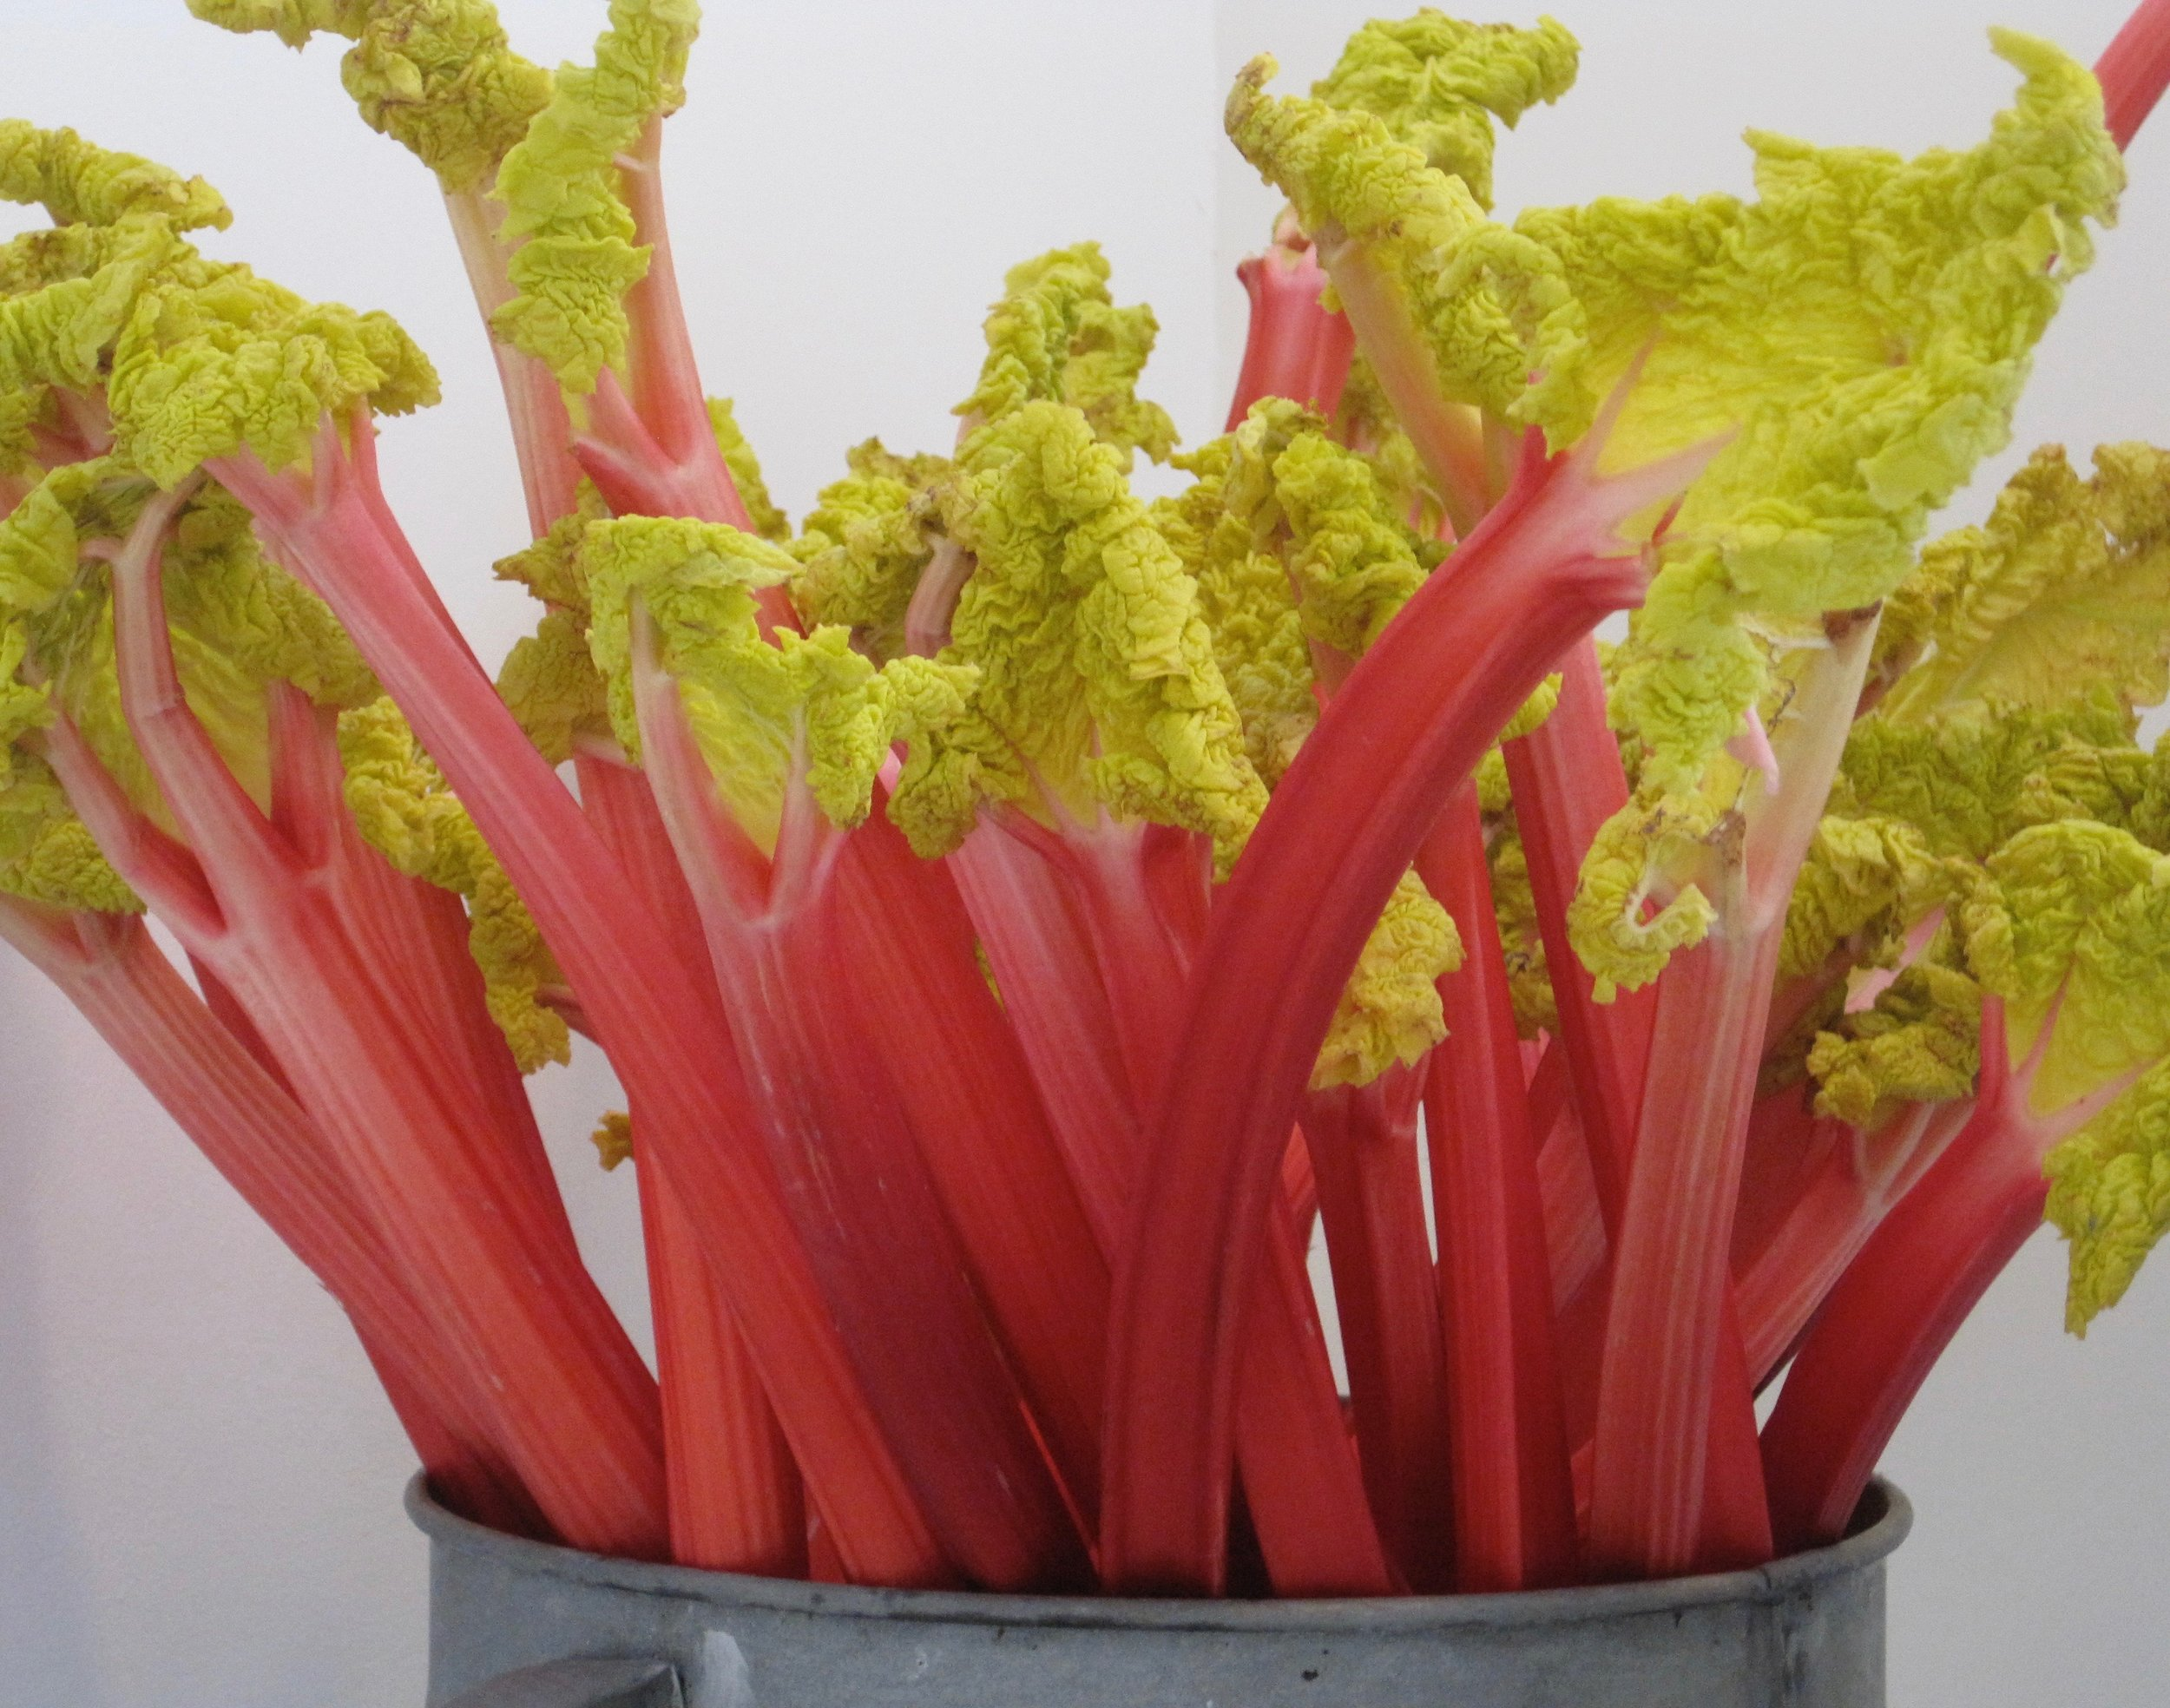 Yorkshire Triangle rhubarb